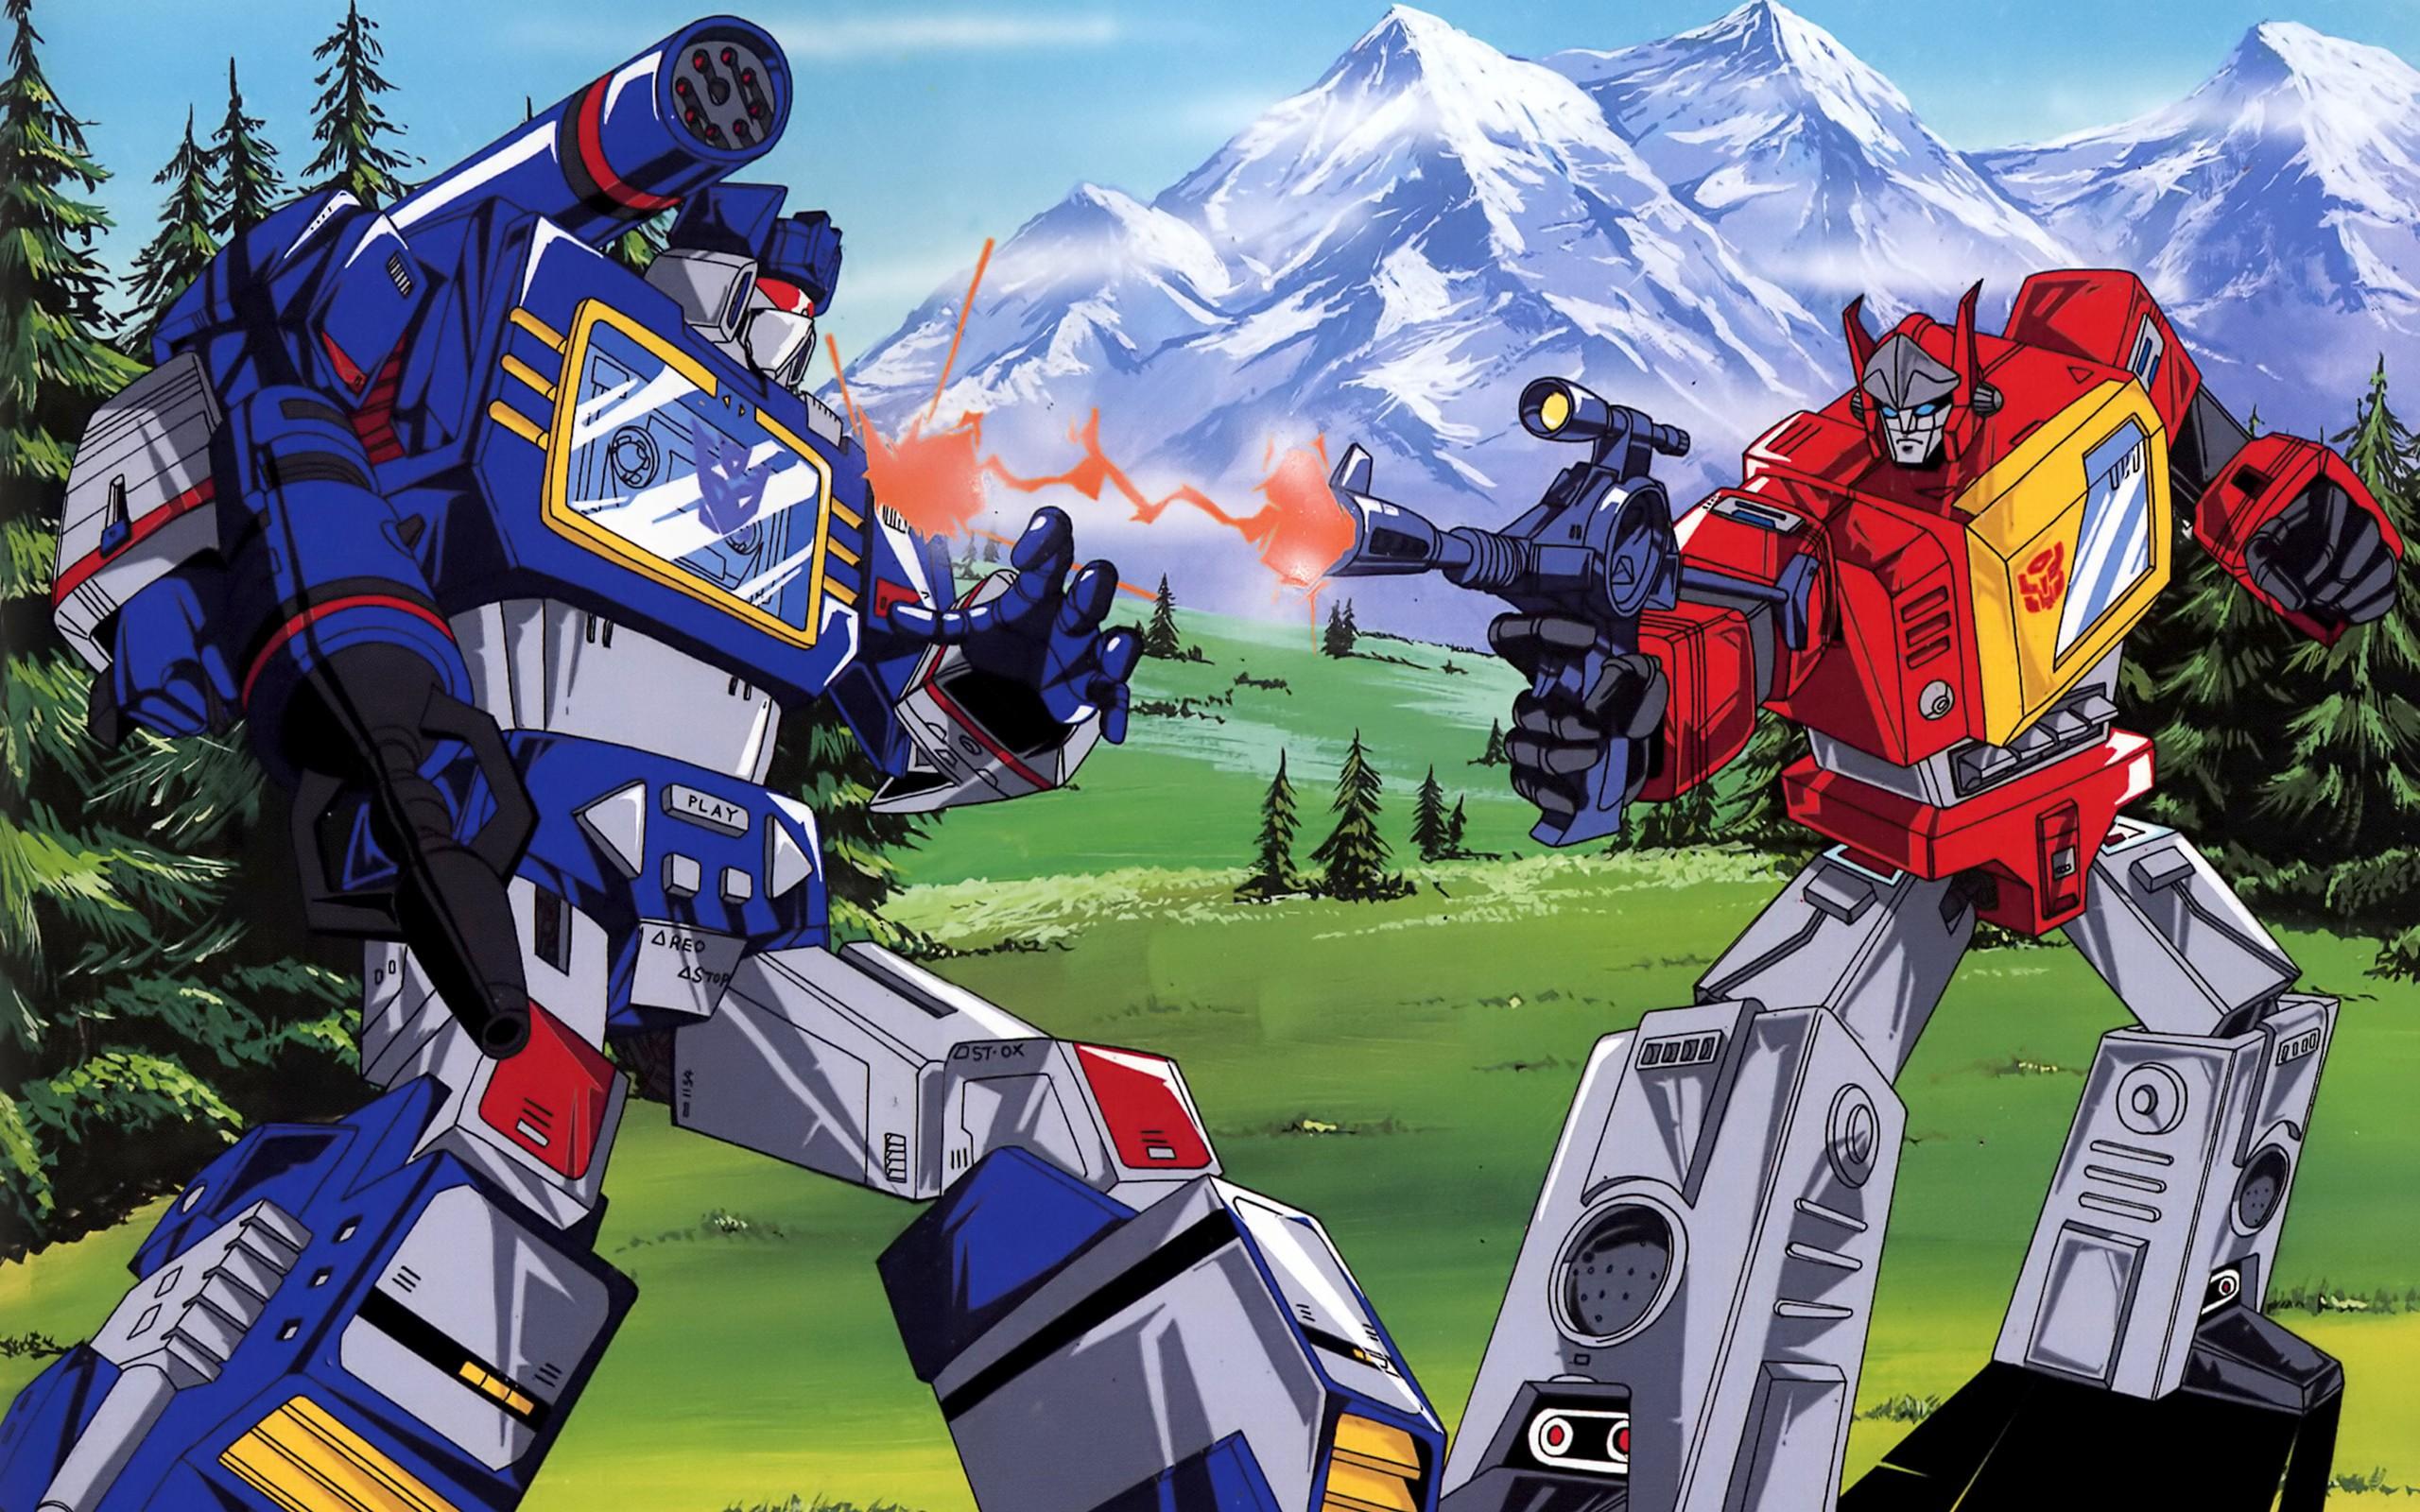 Transformers Generation 1 Cartoon Characters : Transformers g cartoon characters wallpapers and images